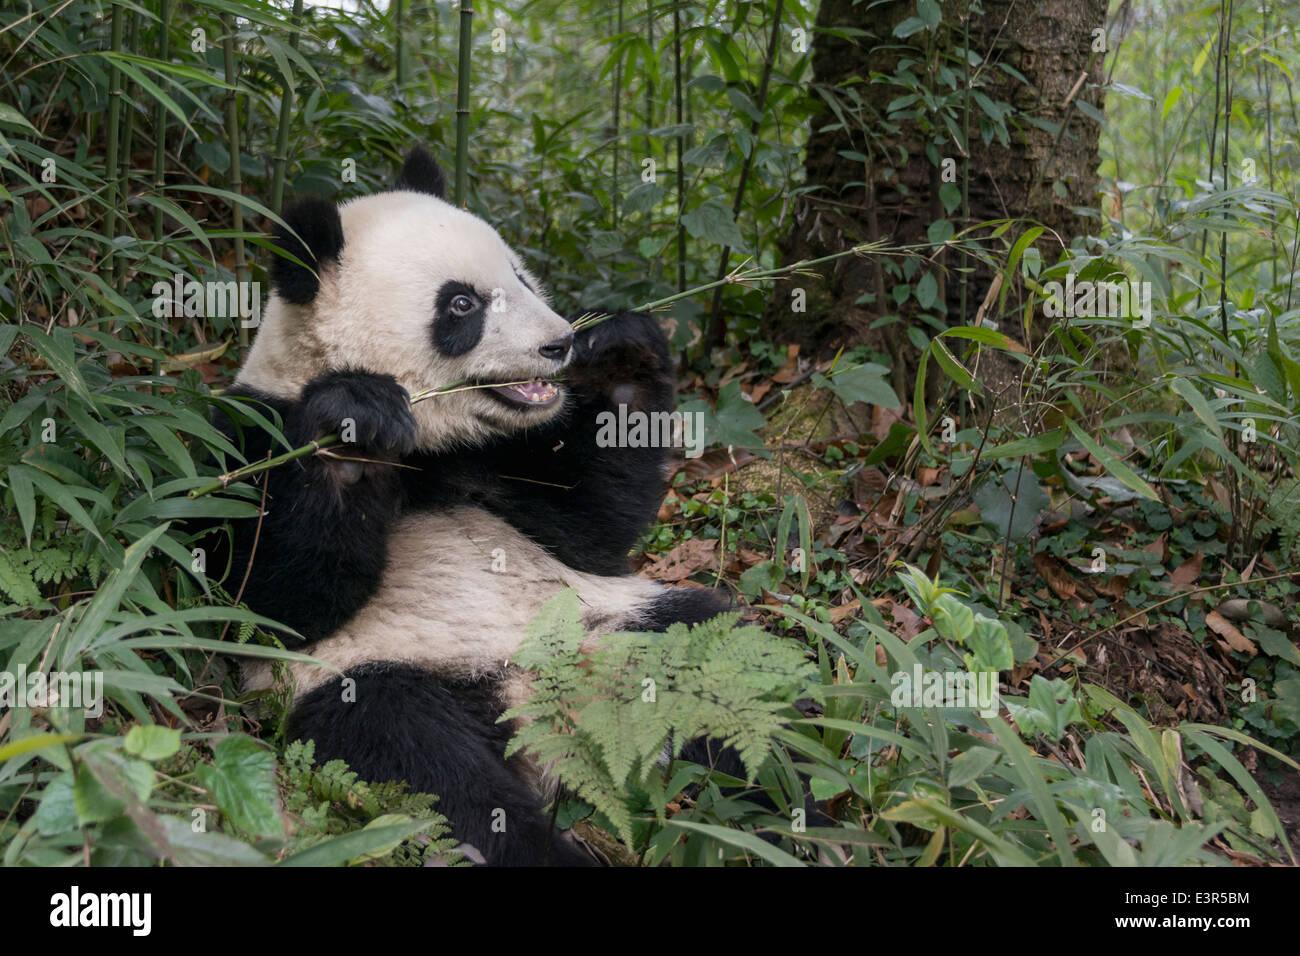 Panda Essen Einen Leckeren Jungen Bambus Stiel Bifeng Xia Provinz